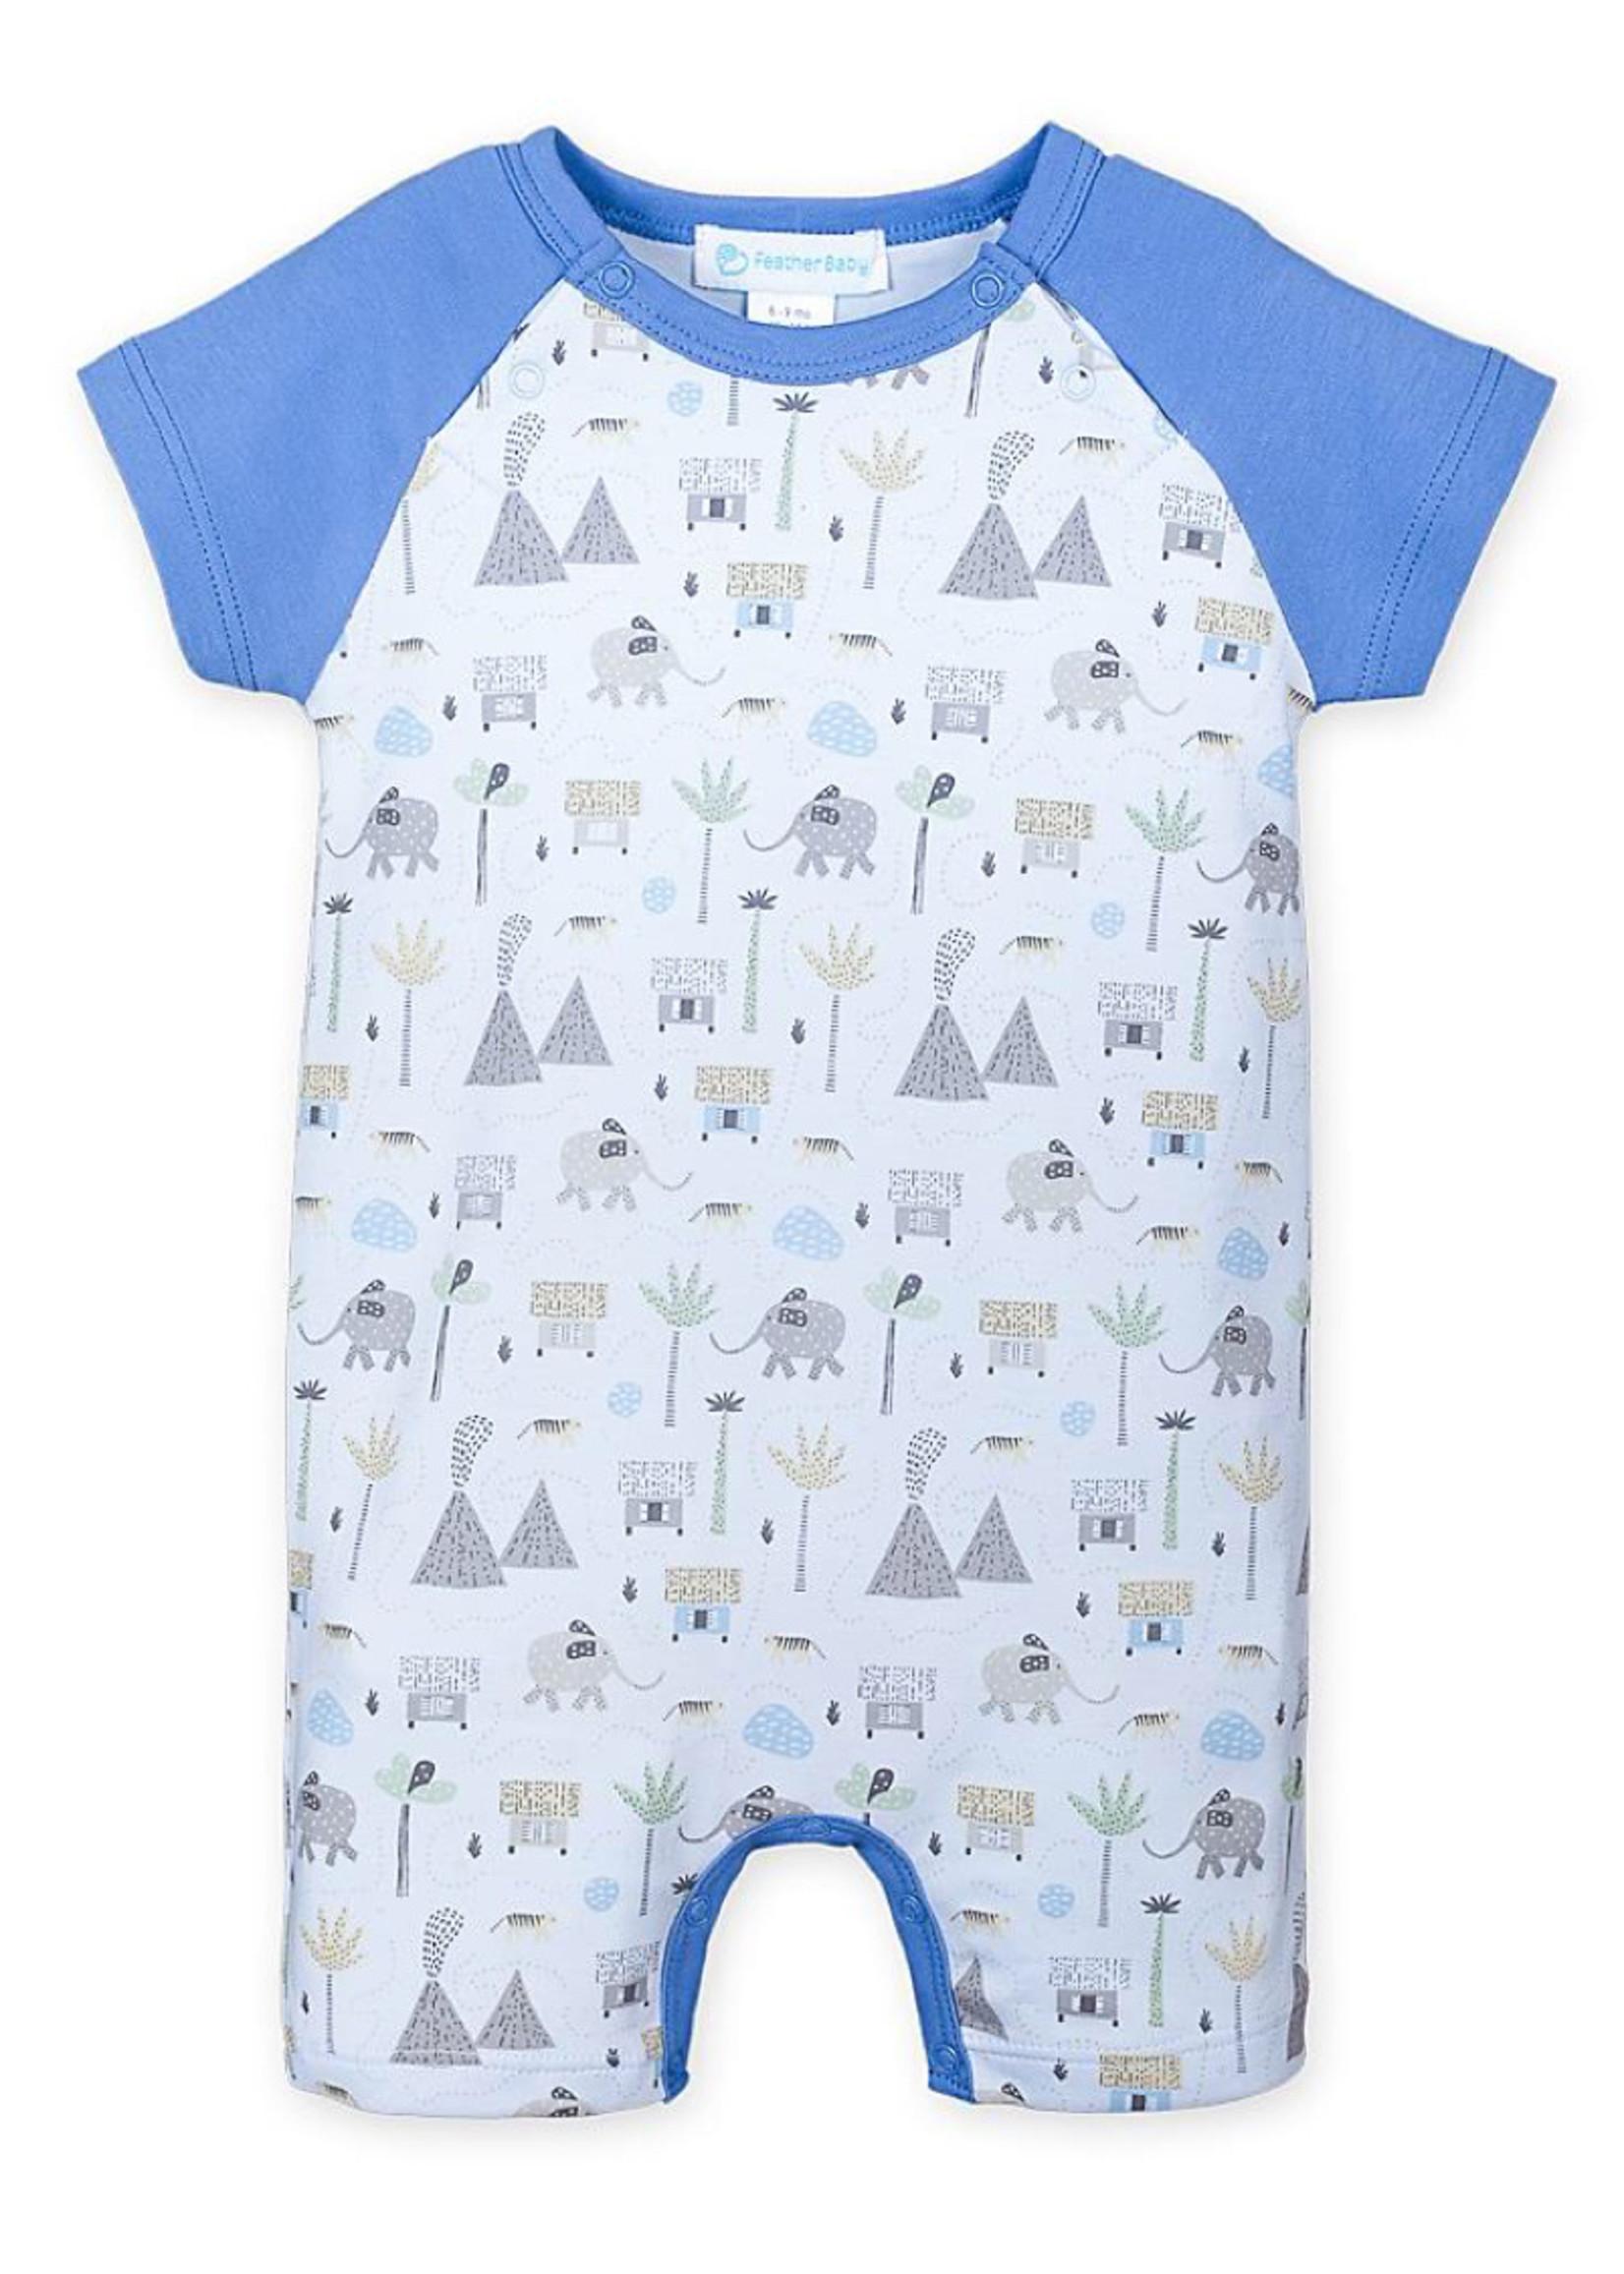 feather baby Volcanos & Elephants Baby Blue Romper